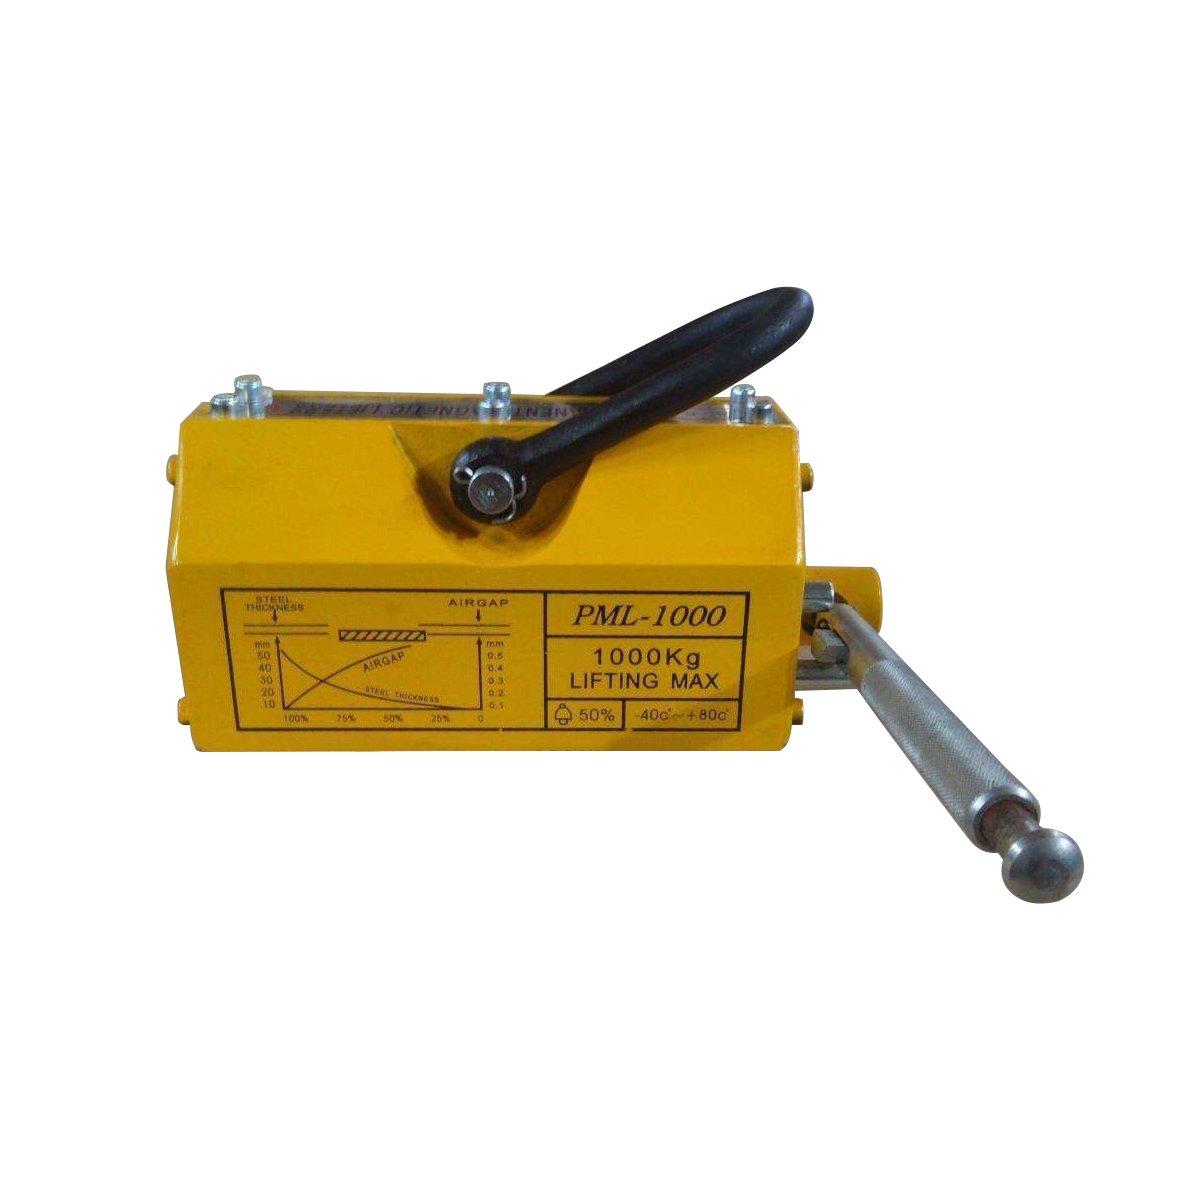 Steel Magnetic Lift 440LB Metal Lifting Magnet Hoist Shop Crane for heavy duty 200KG Neodymium Lift Hoist